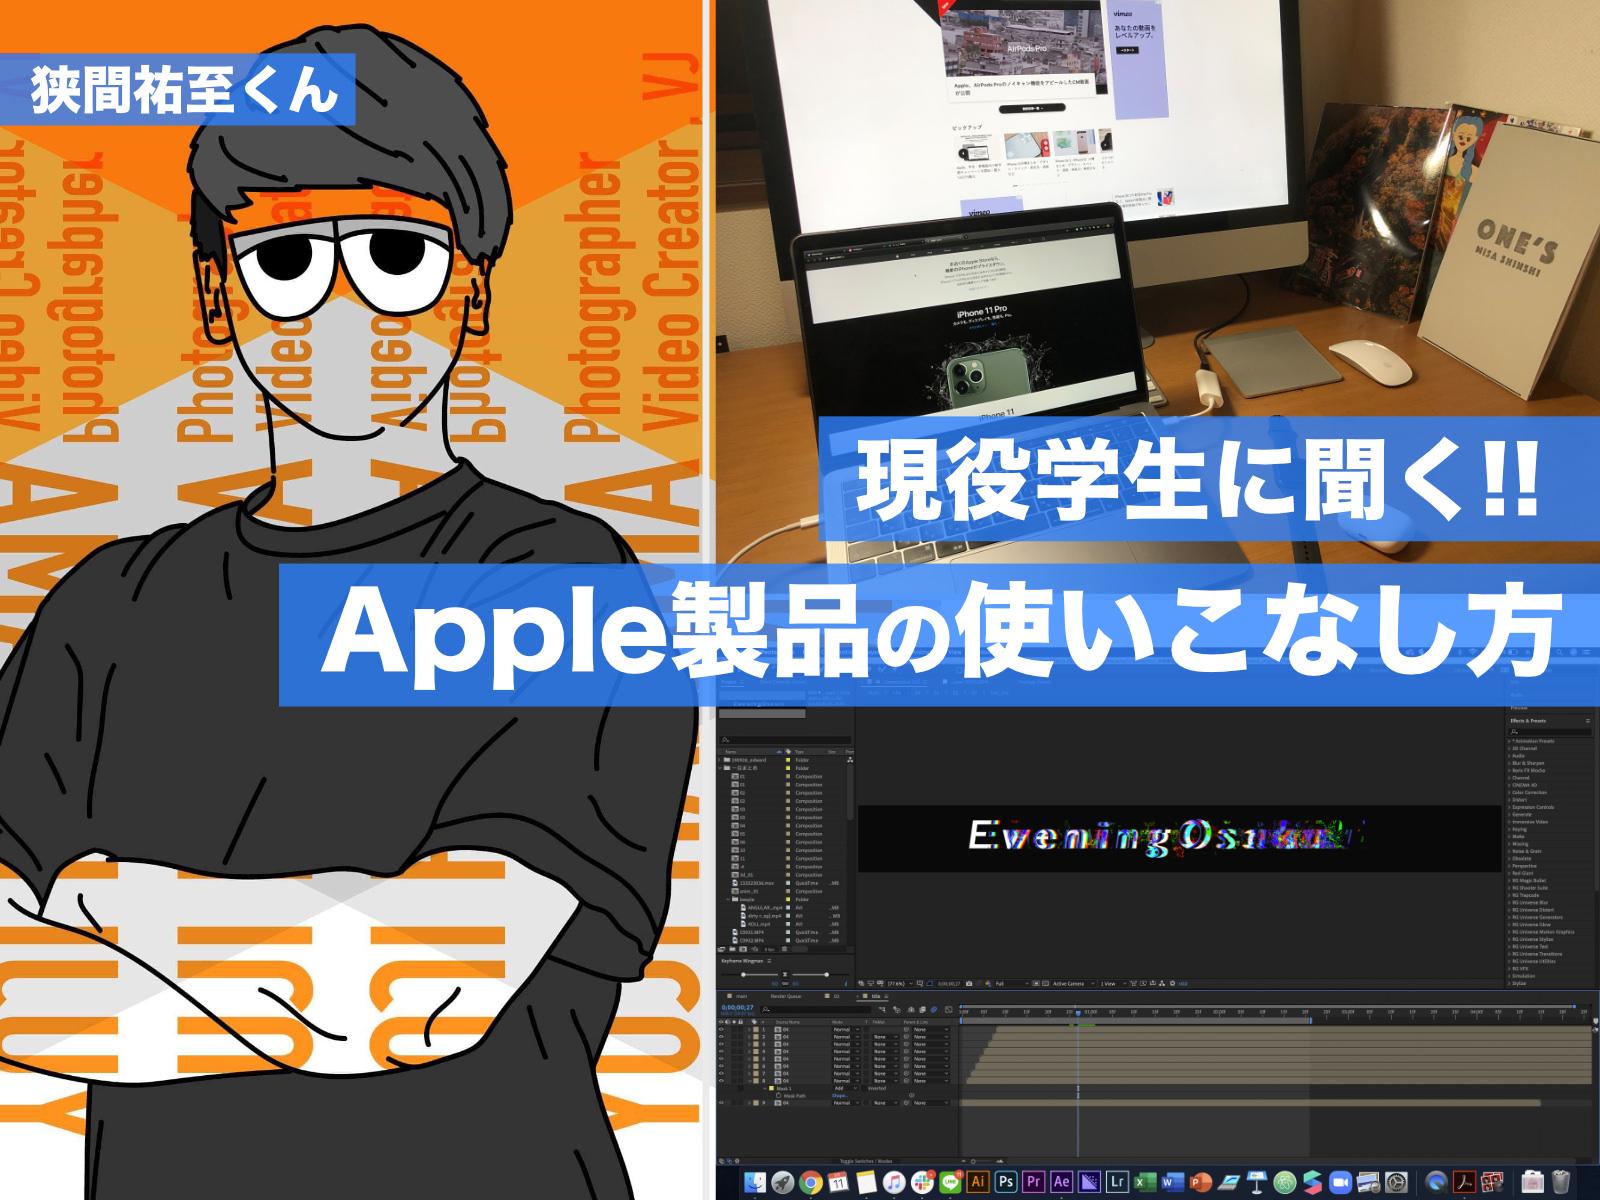 Apple backtoschool campaign interview 2020 hazama